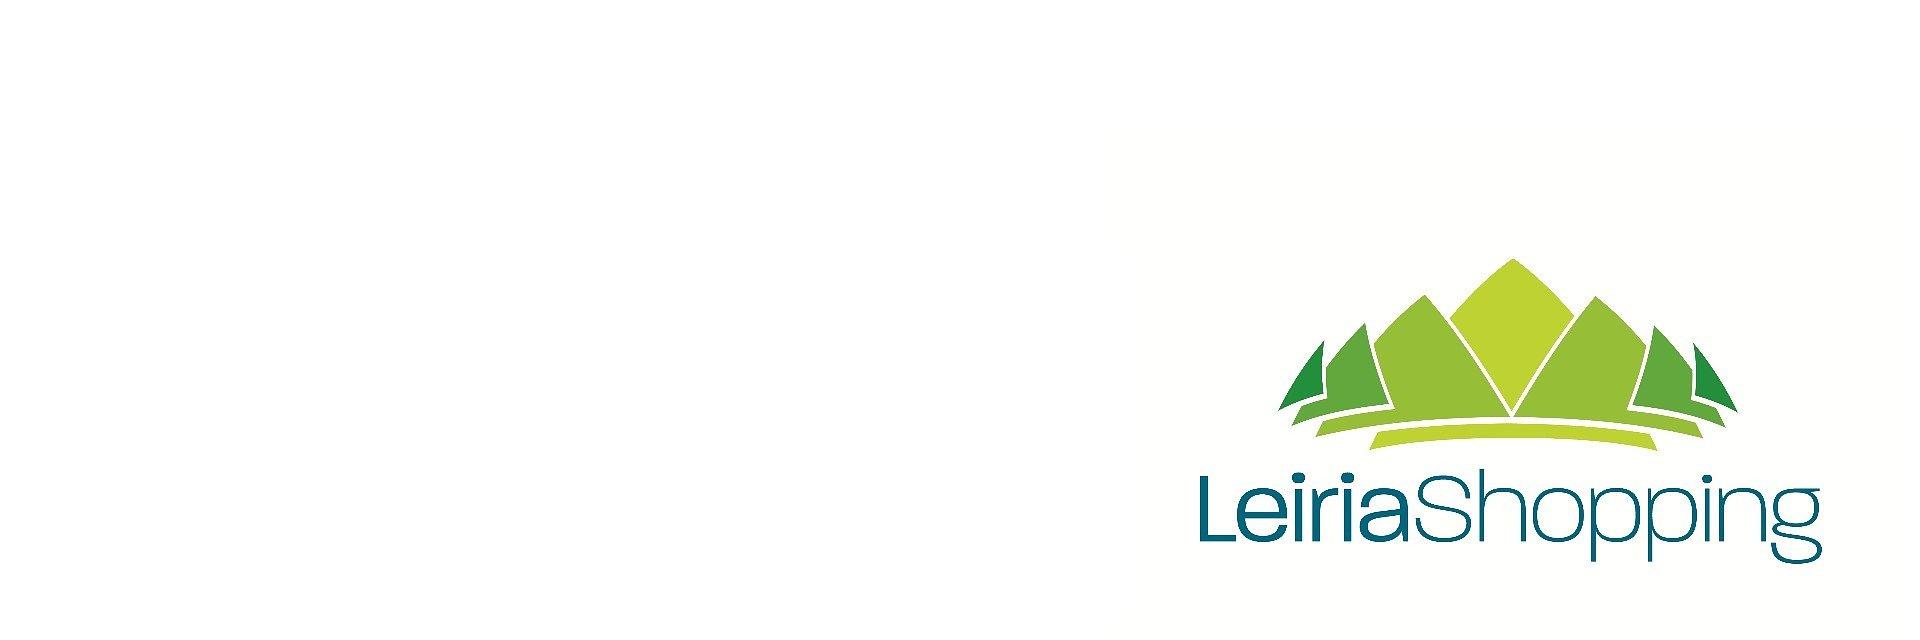 LeiriaShopping implementou medidas adicionais para garantir segurança de visitantes, lojistas, prestadores de serviços e colaboradores